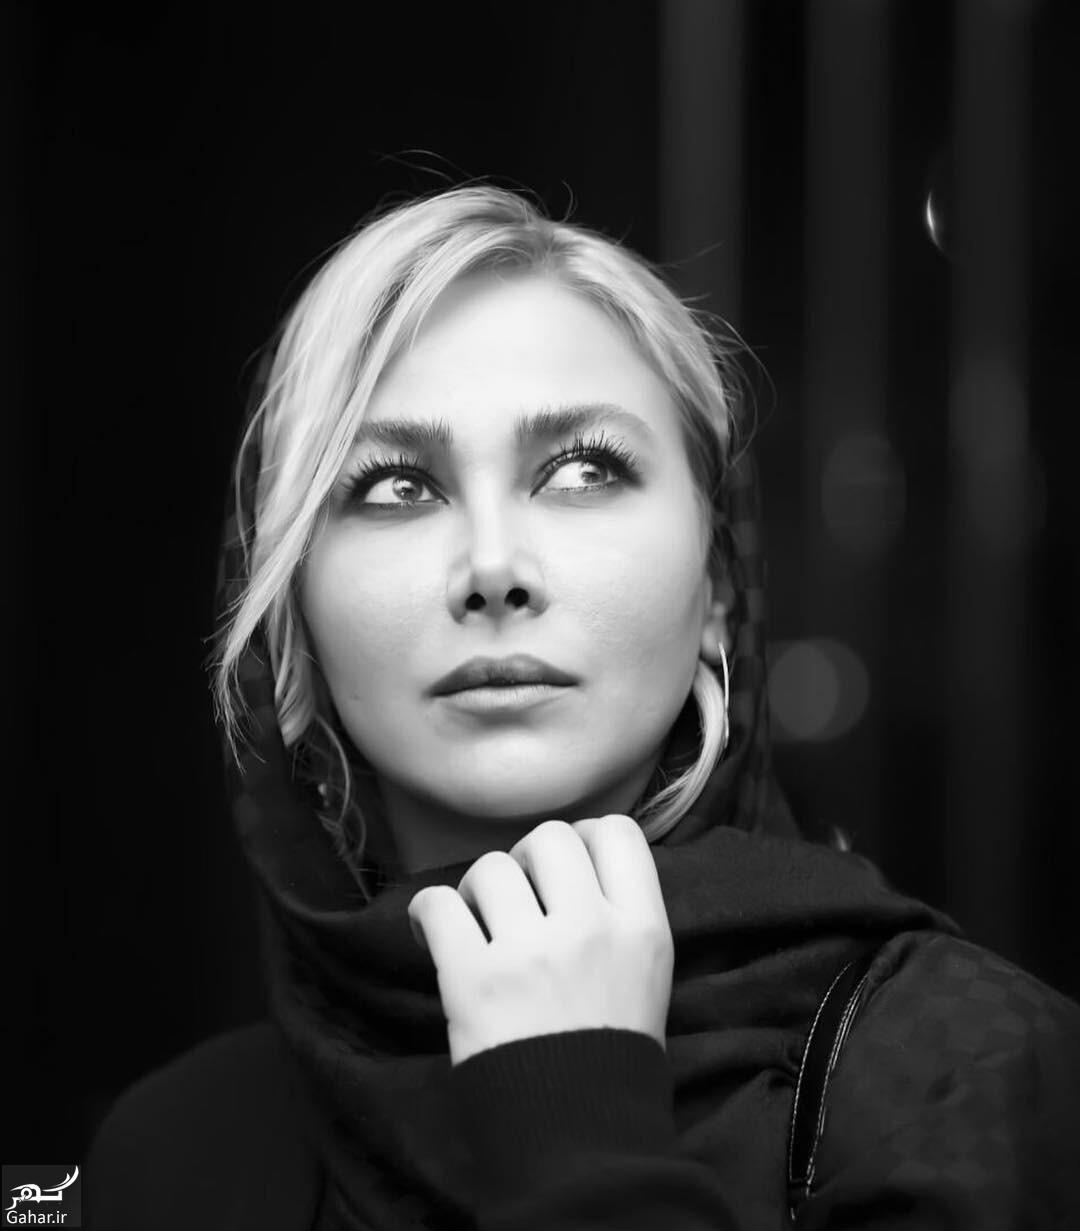 BQjFUFBBeeL 1 گوشواره عجیب آنا نعمتی در اکران فیلم ماحی + عکس